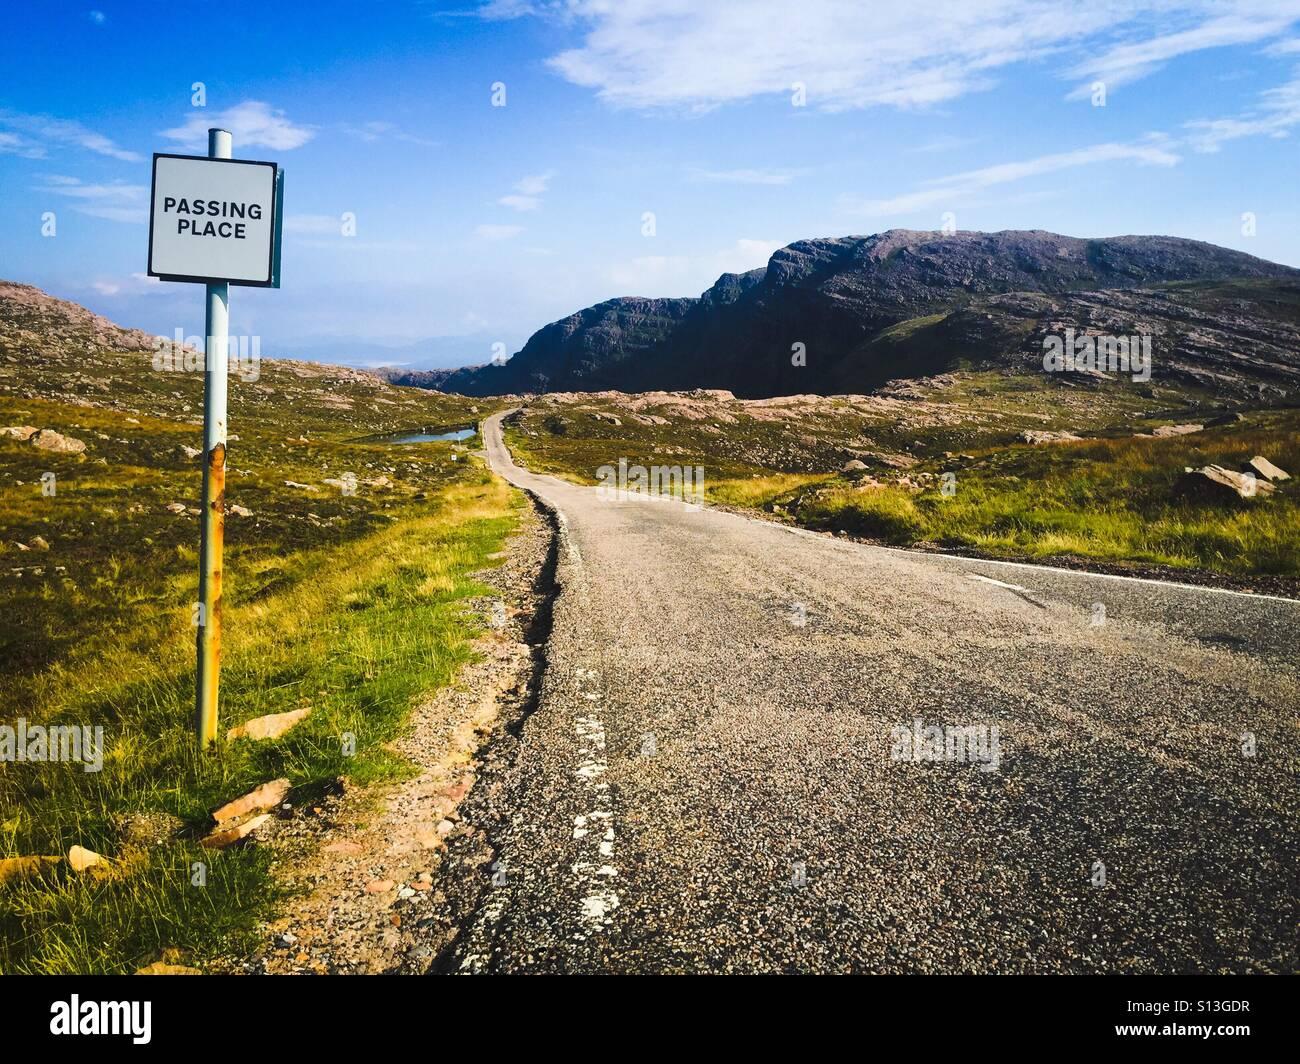 Passing place on single track road on Applecross peninsula on West Coast of Scotland, UK - Stock Image